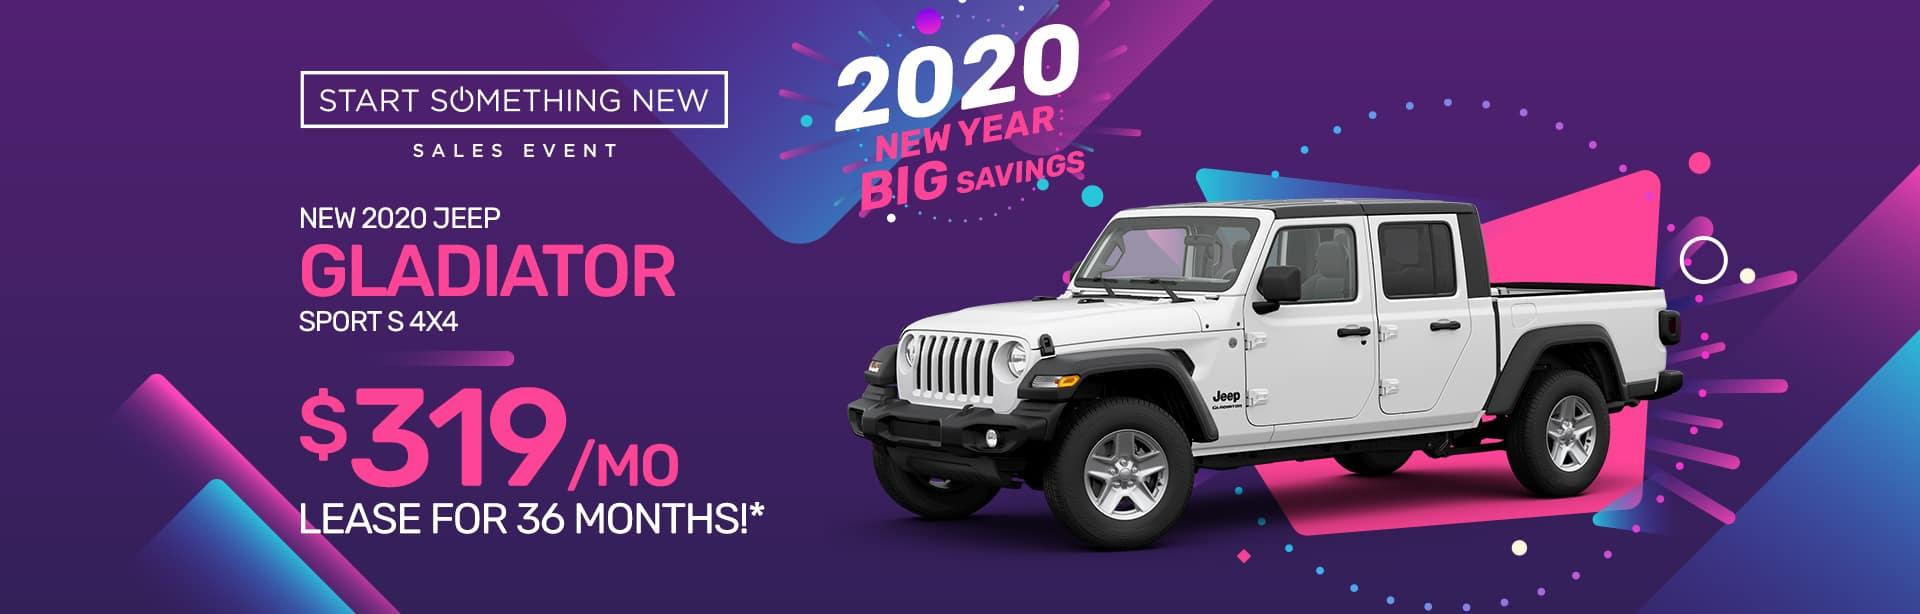 New Jeep Gladiator Dealer near Terre Haute.